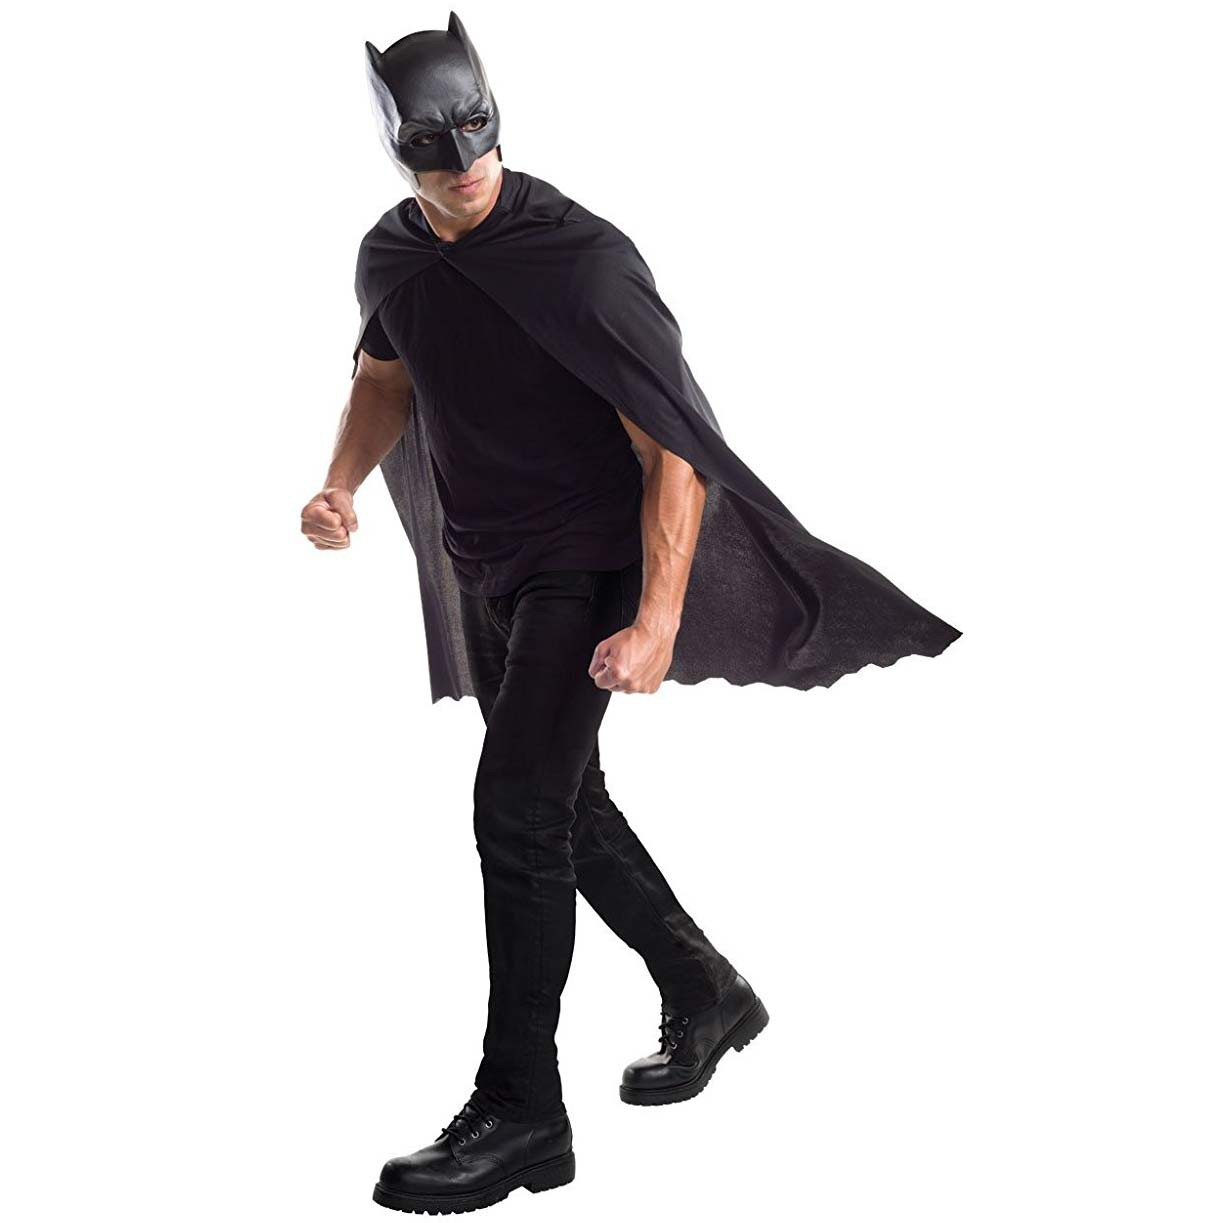 Batman Costume Masked Cape